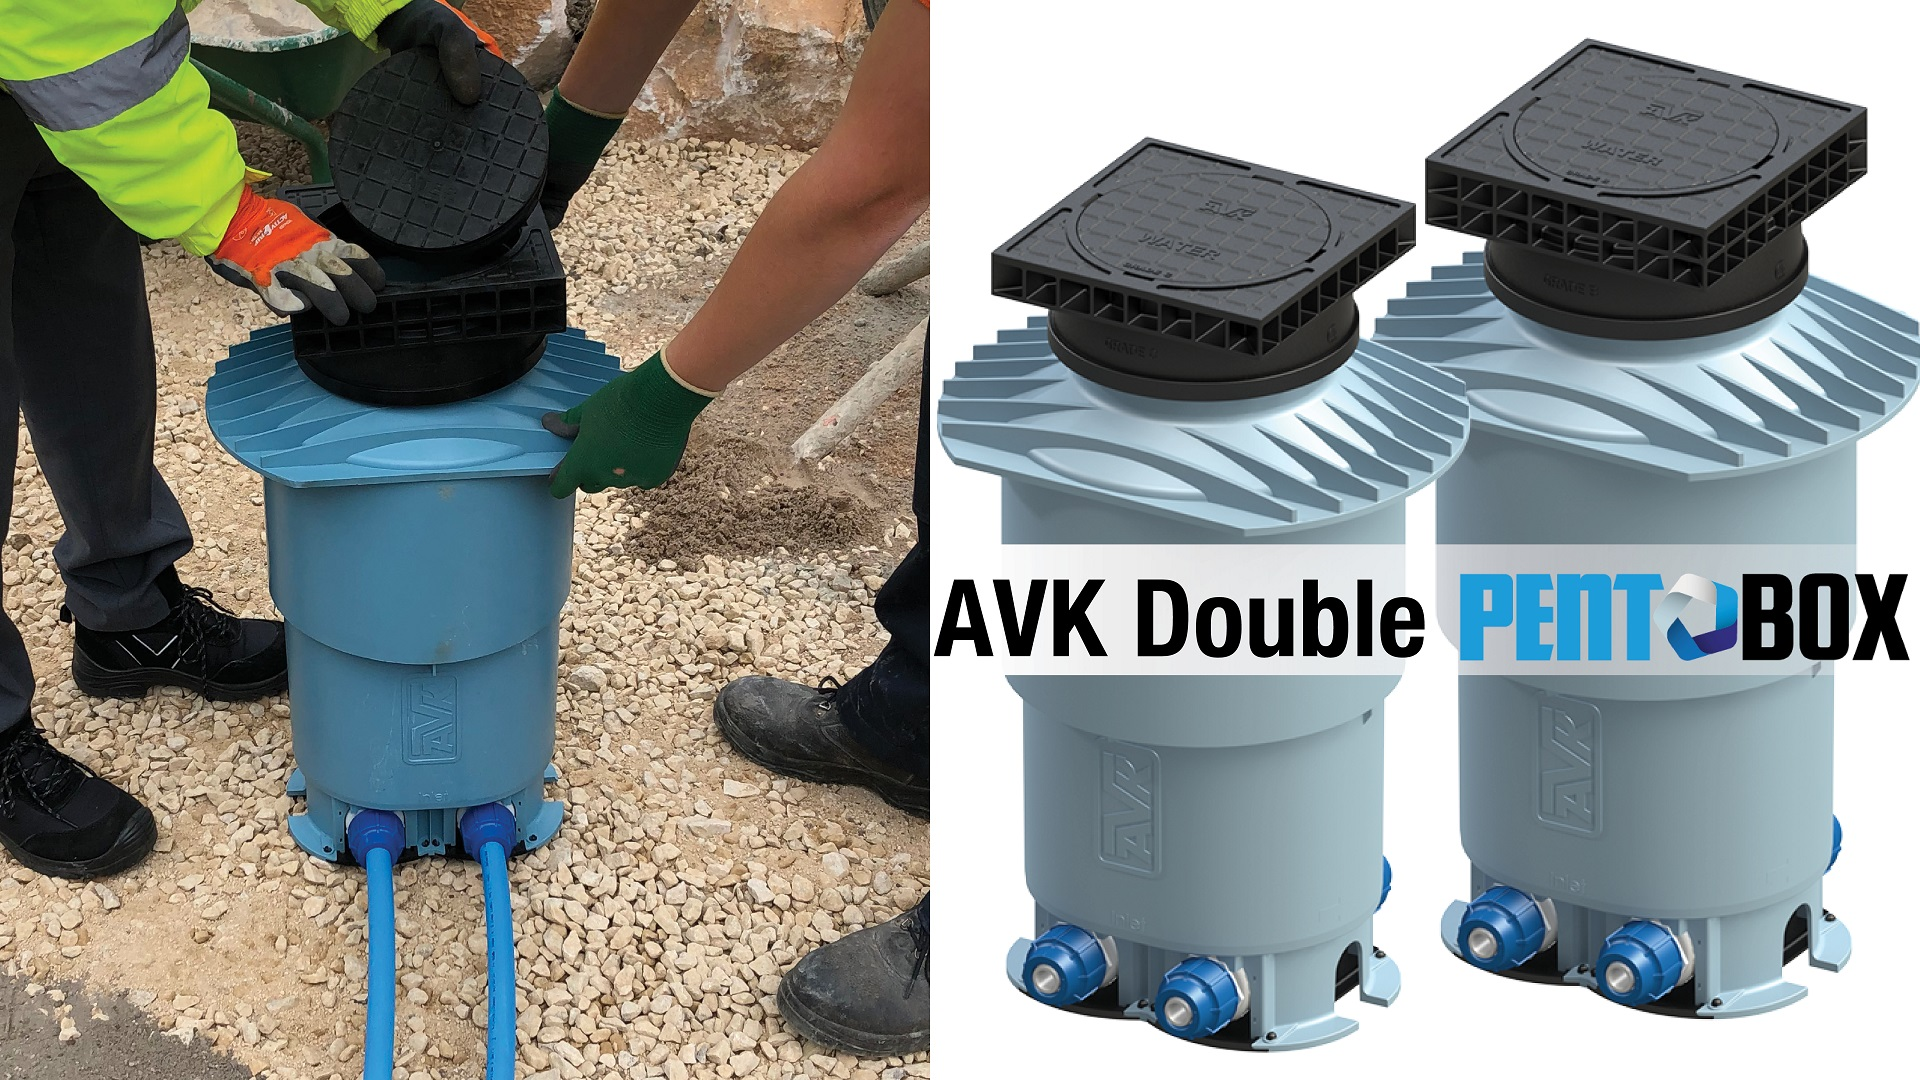 AVK Double Pentobox Water mains to meter